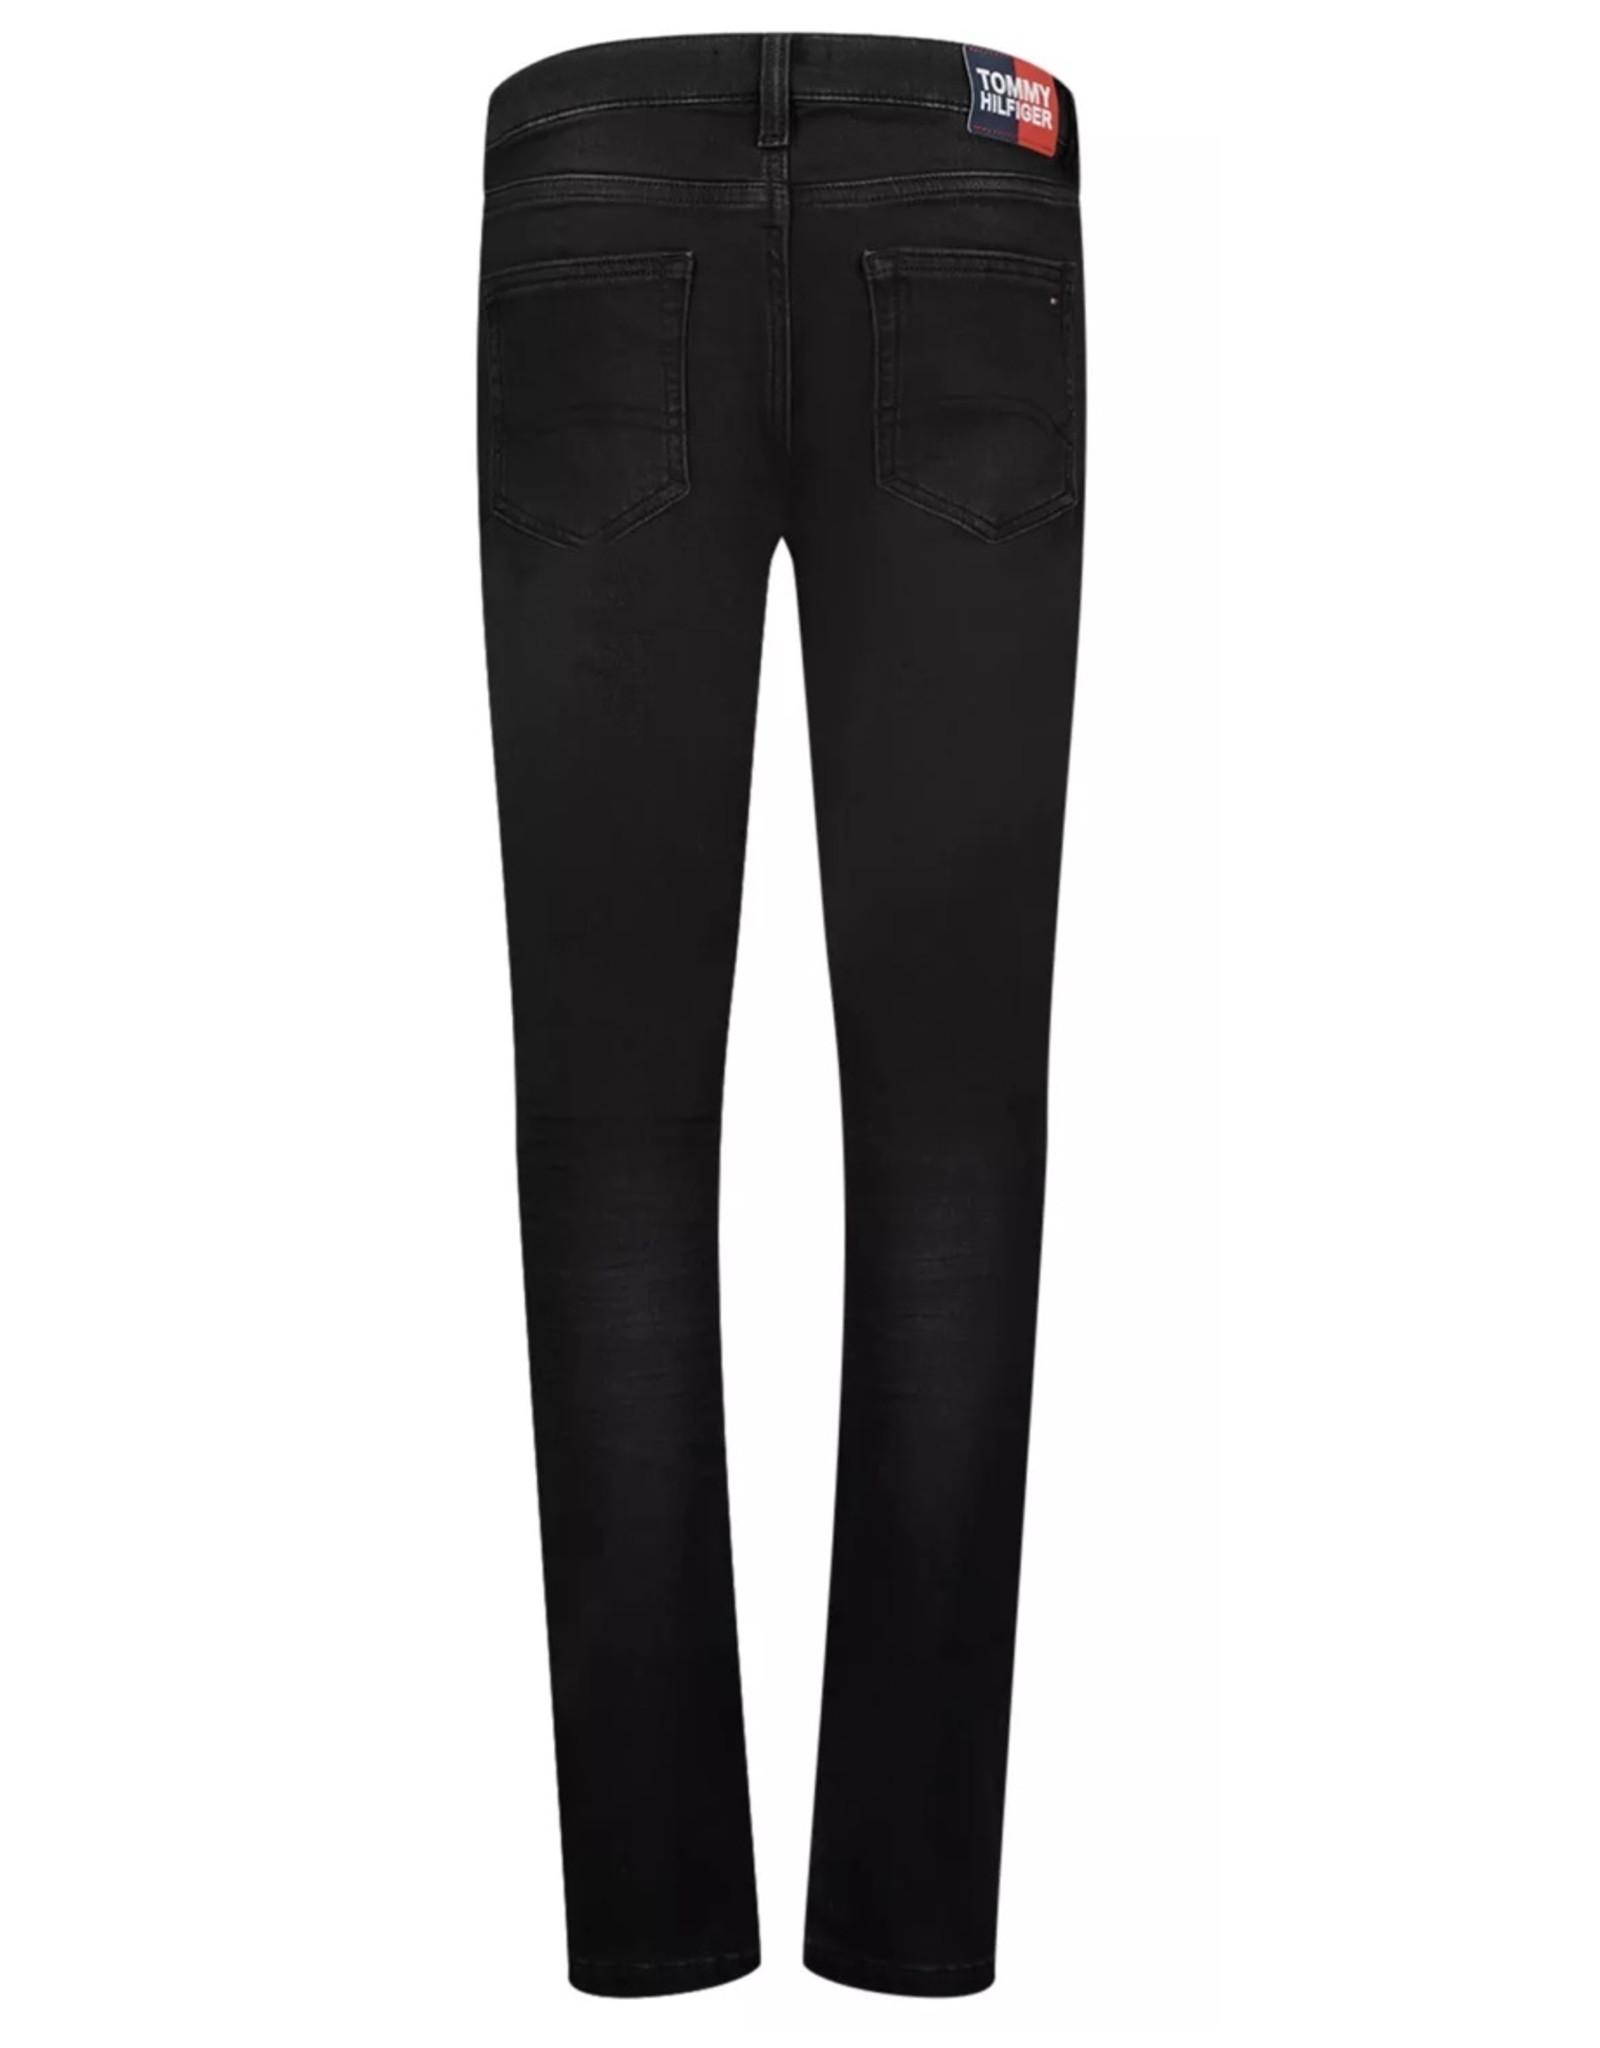 Tommy Hilfiger 6867 Jeans